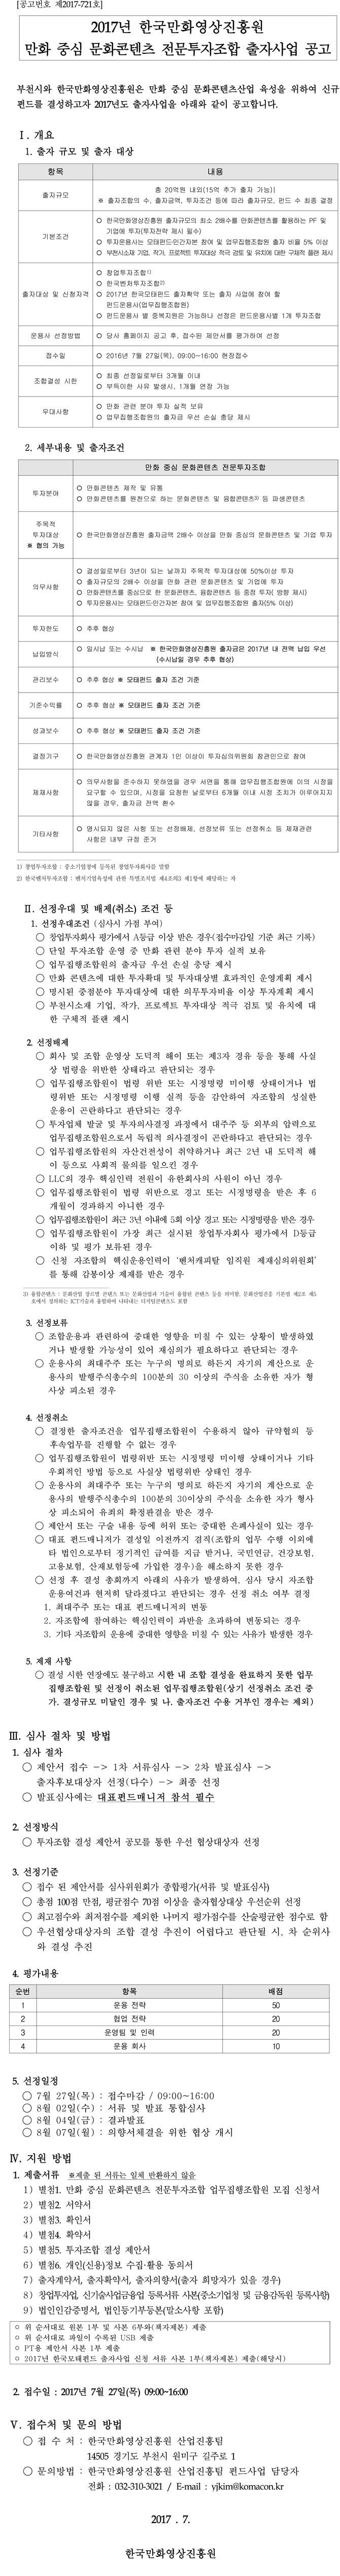 KOMACON_펀드 업무집행조합원 모집공고문_-1.jpg